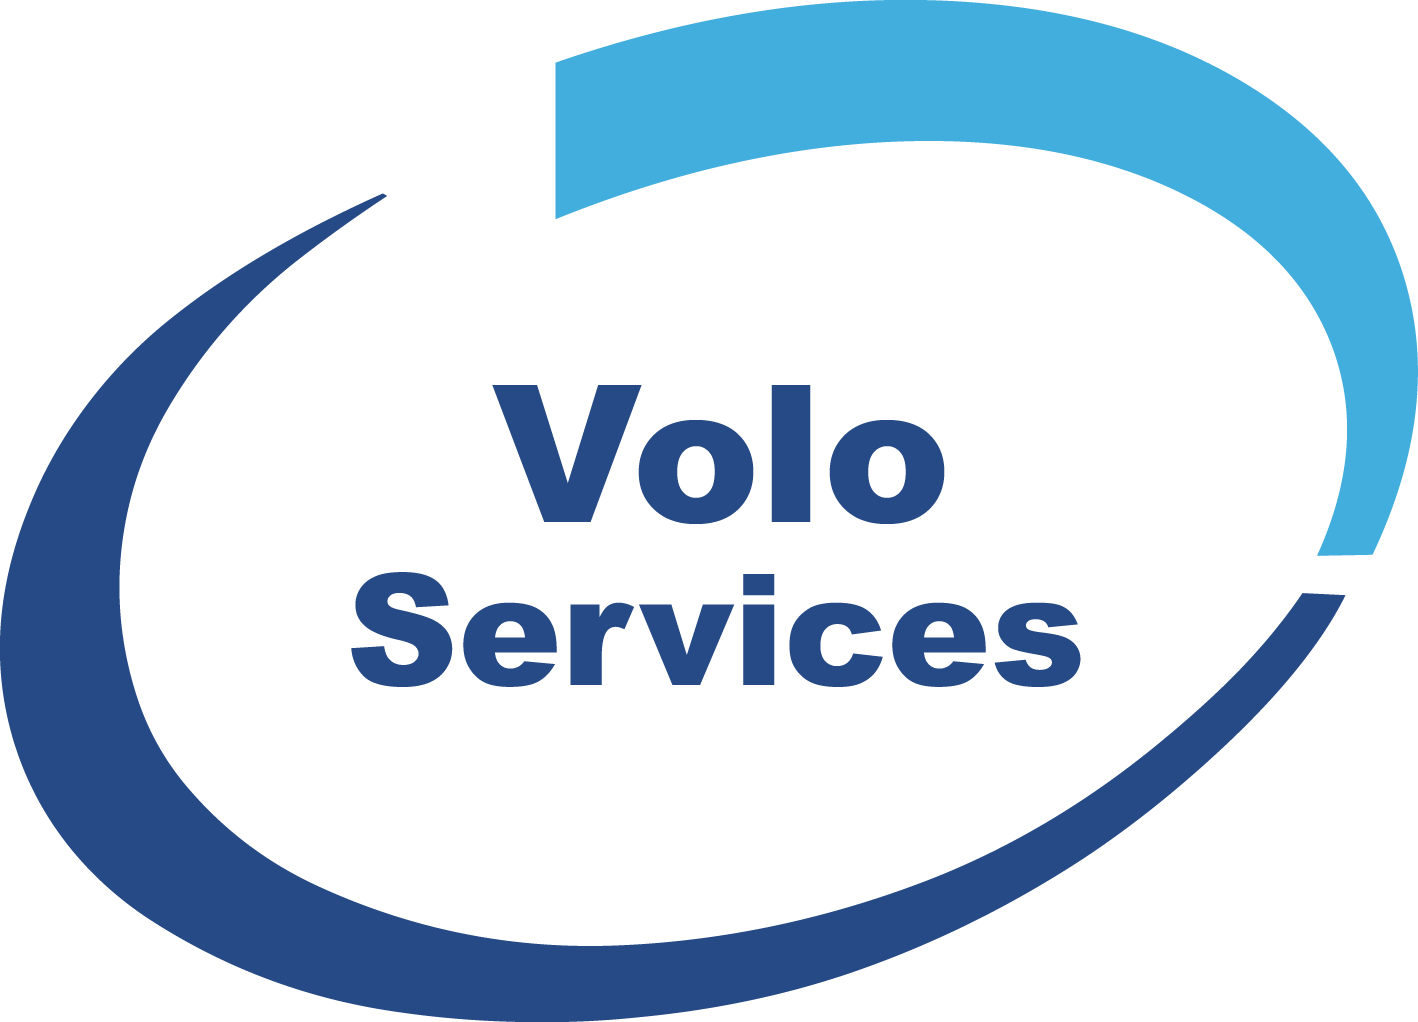 Volo Services